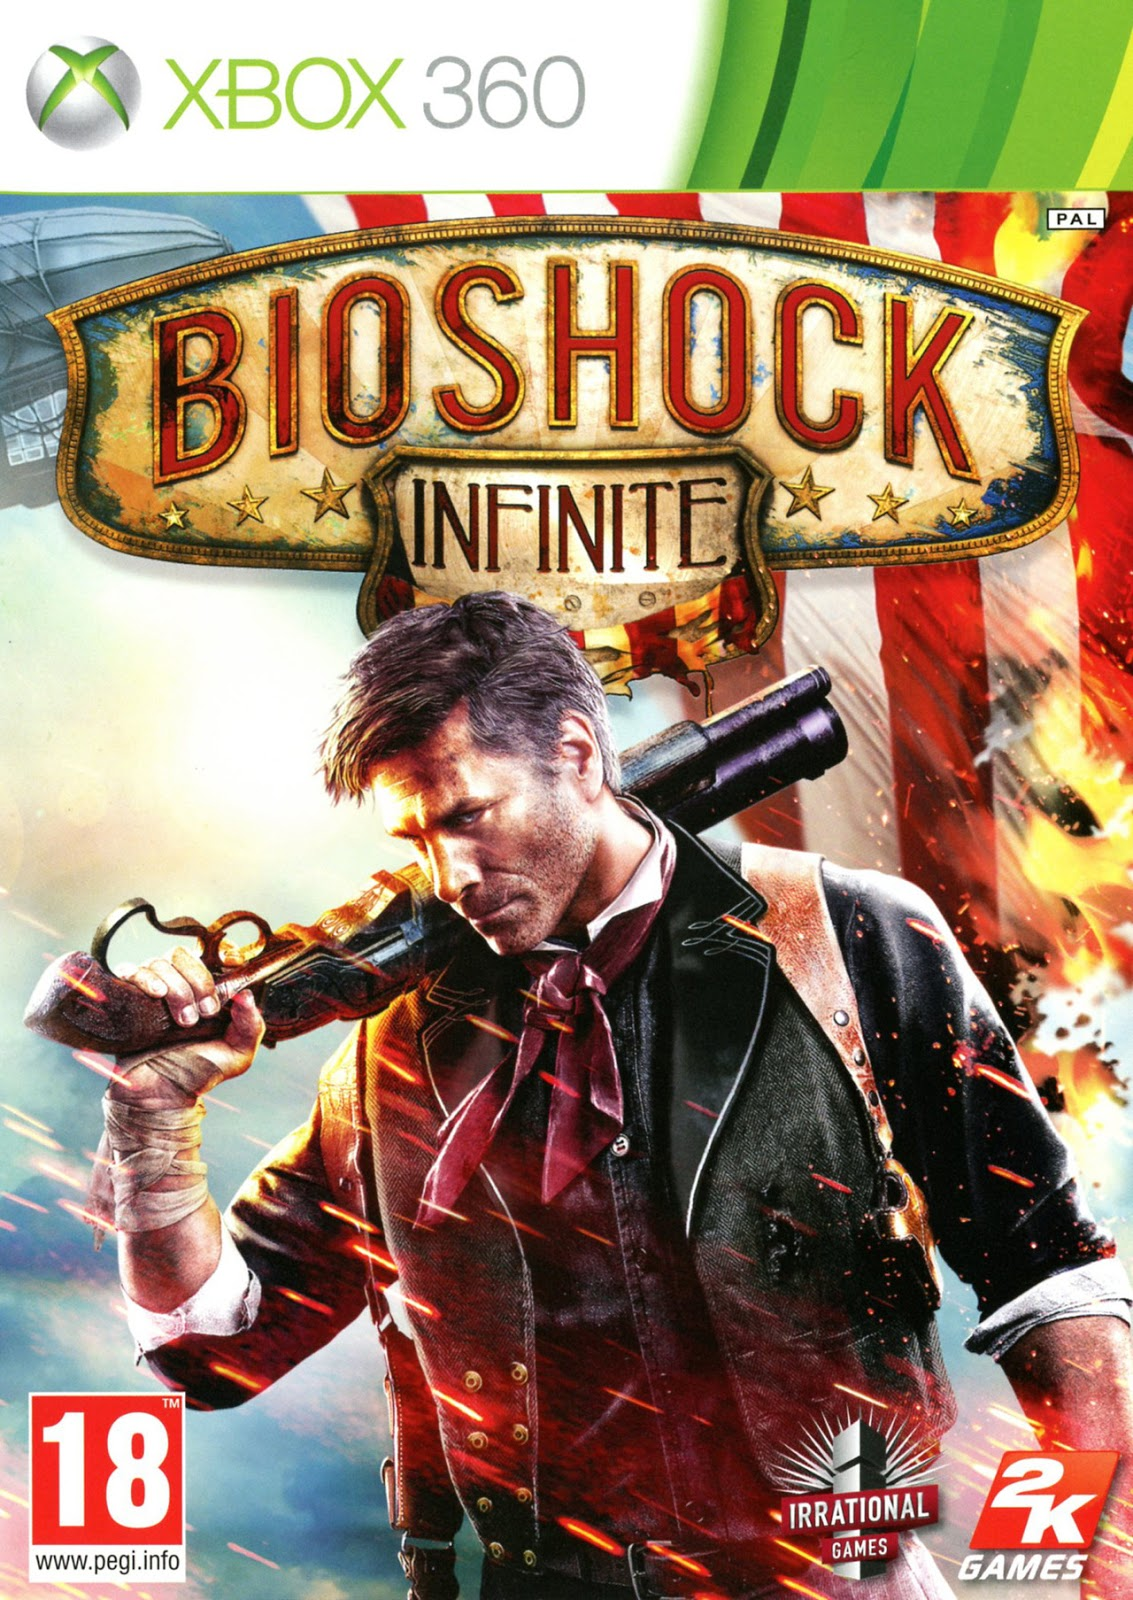 jaquette bioshock infinite xbox 360 cover avant g 1364207312 - BioShock [Spanish] [Region Free] XBOX360